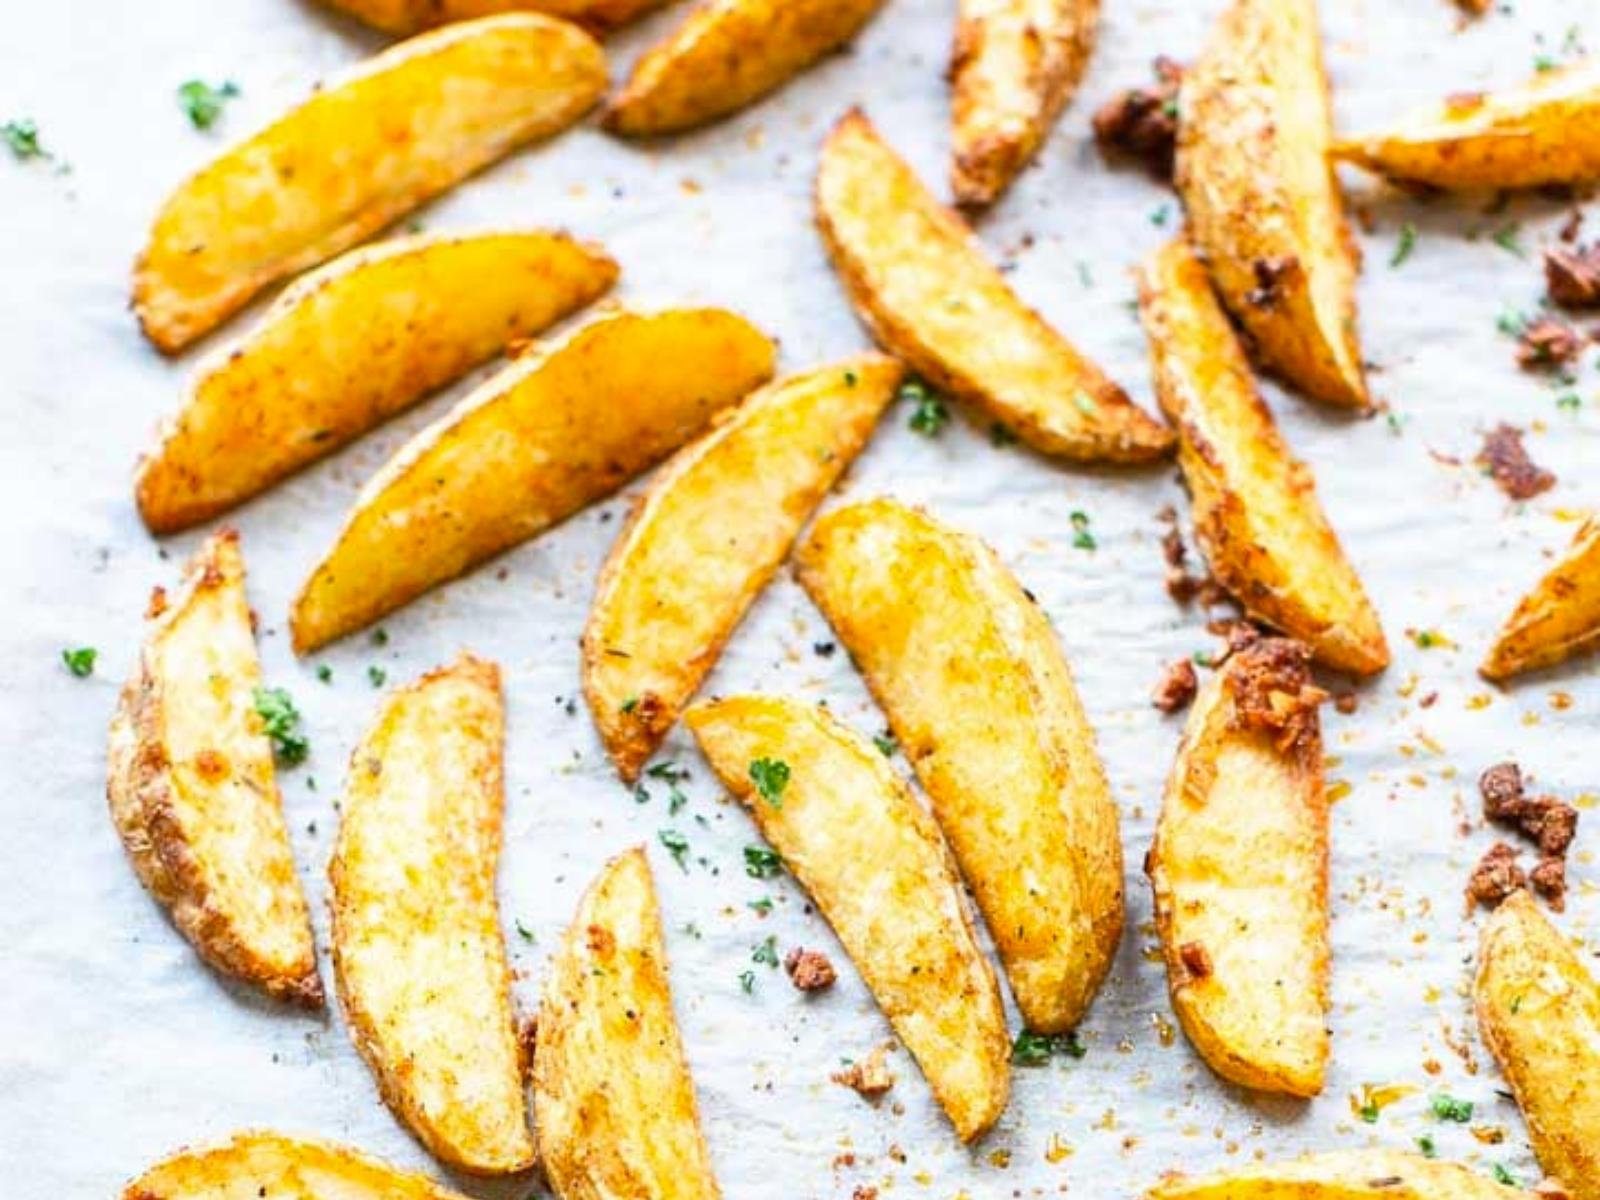 Crispy vegan well flavored potato wedges